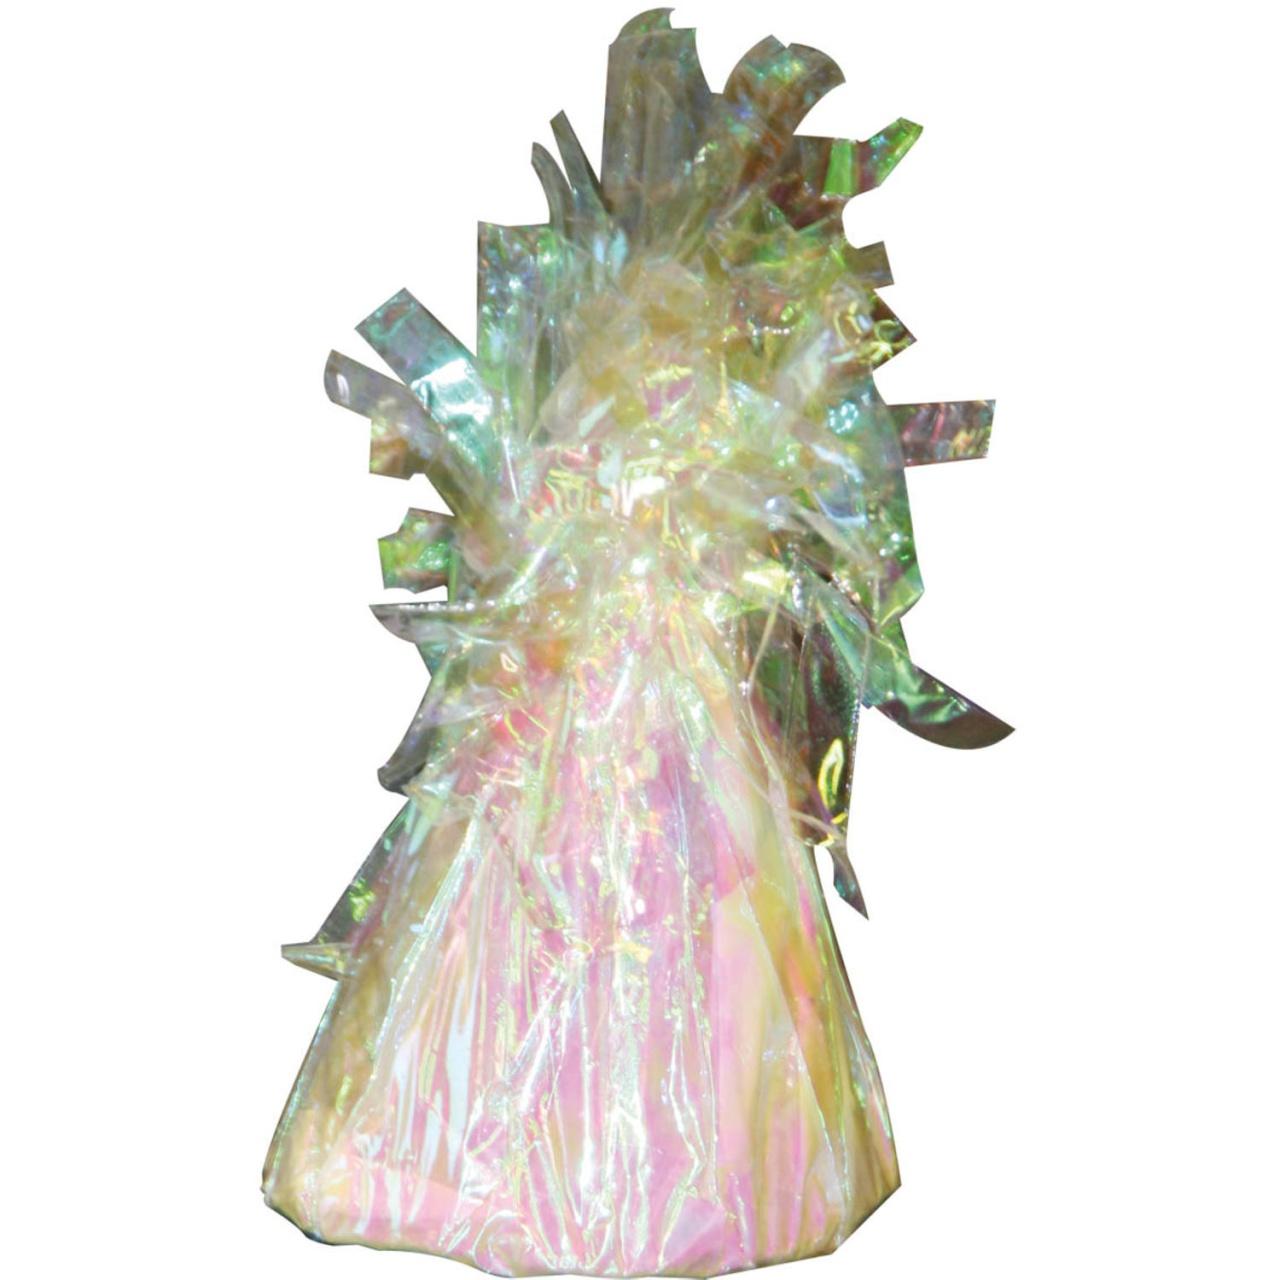 Ballongewicht in Folie perlmuttfarben holo ca 145-170 g